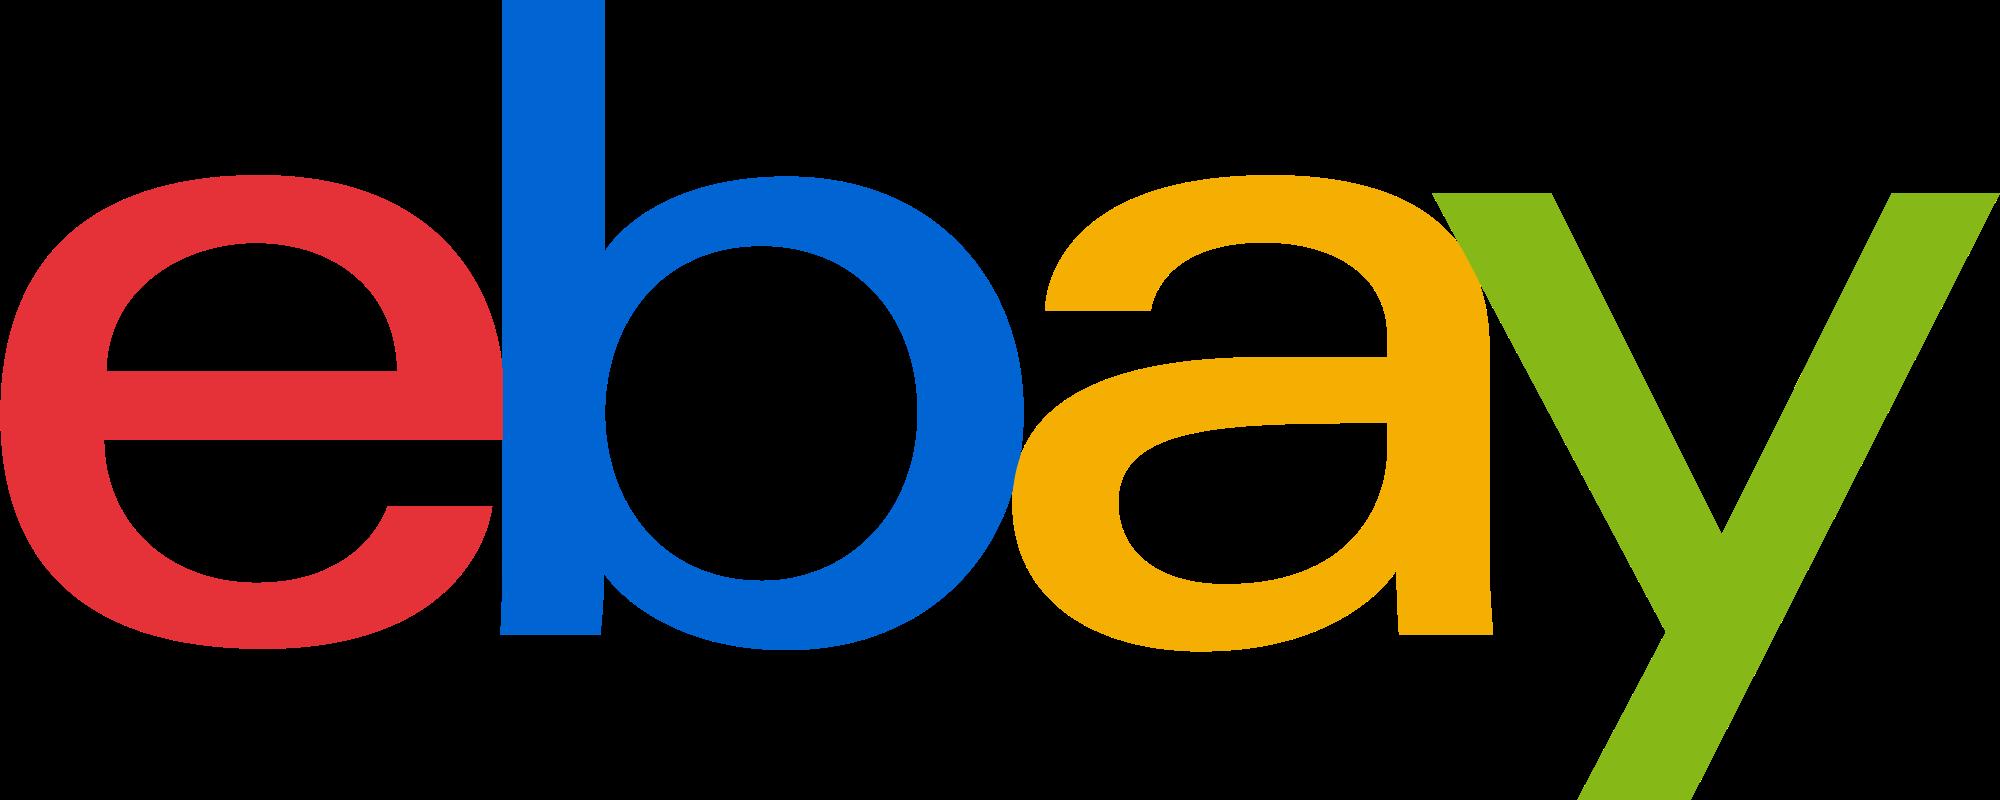 phone number for ebay